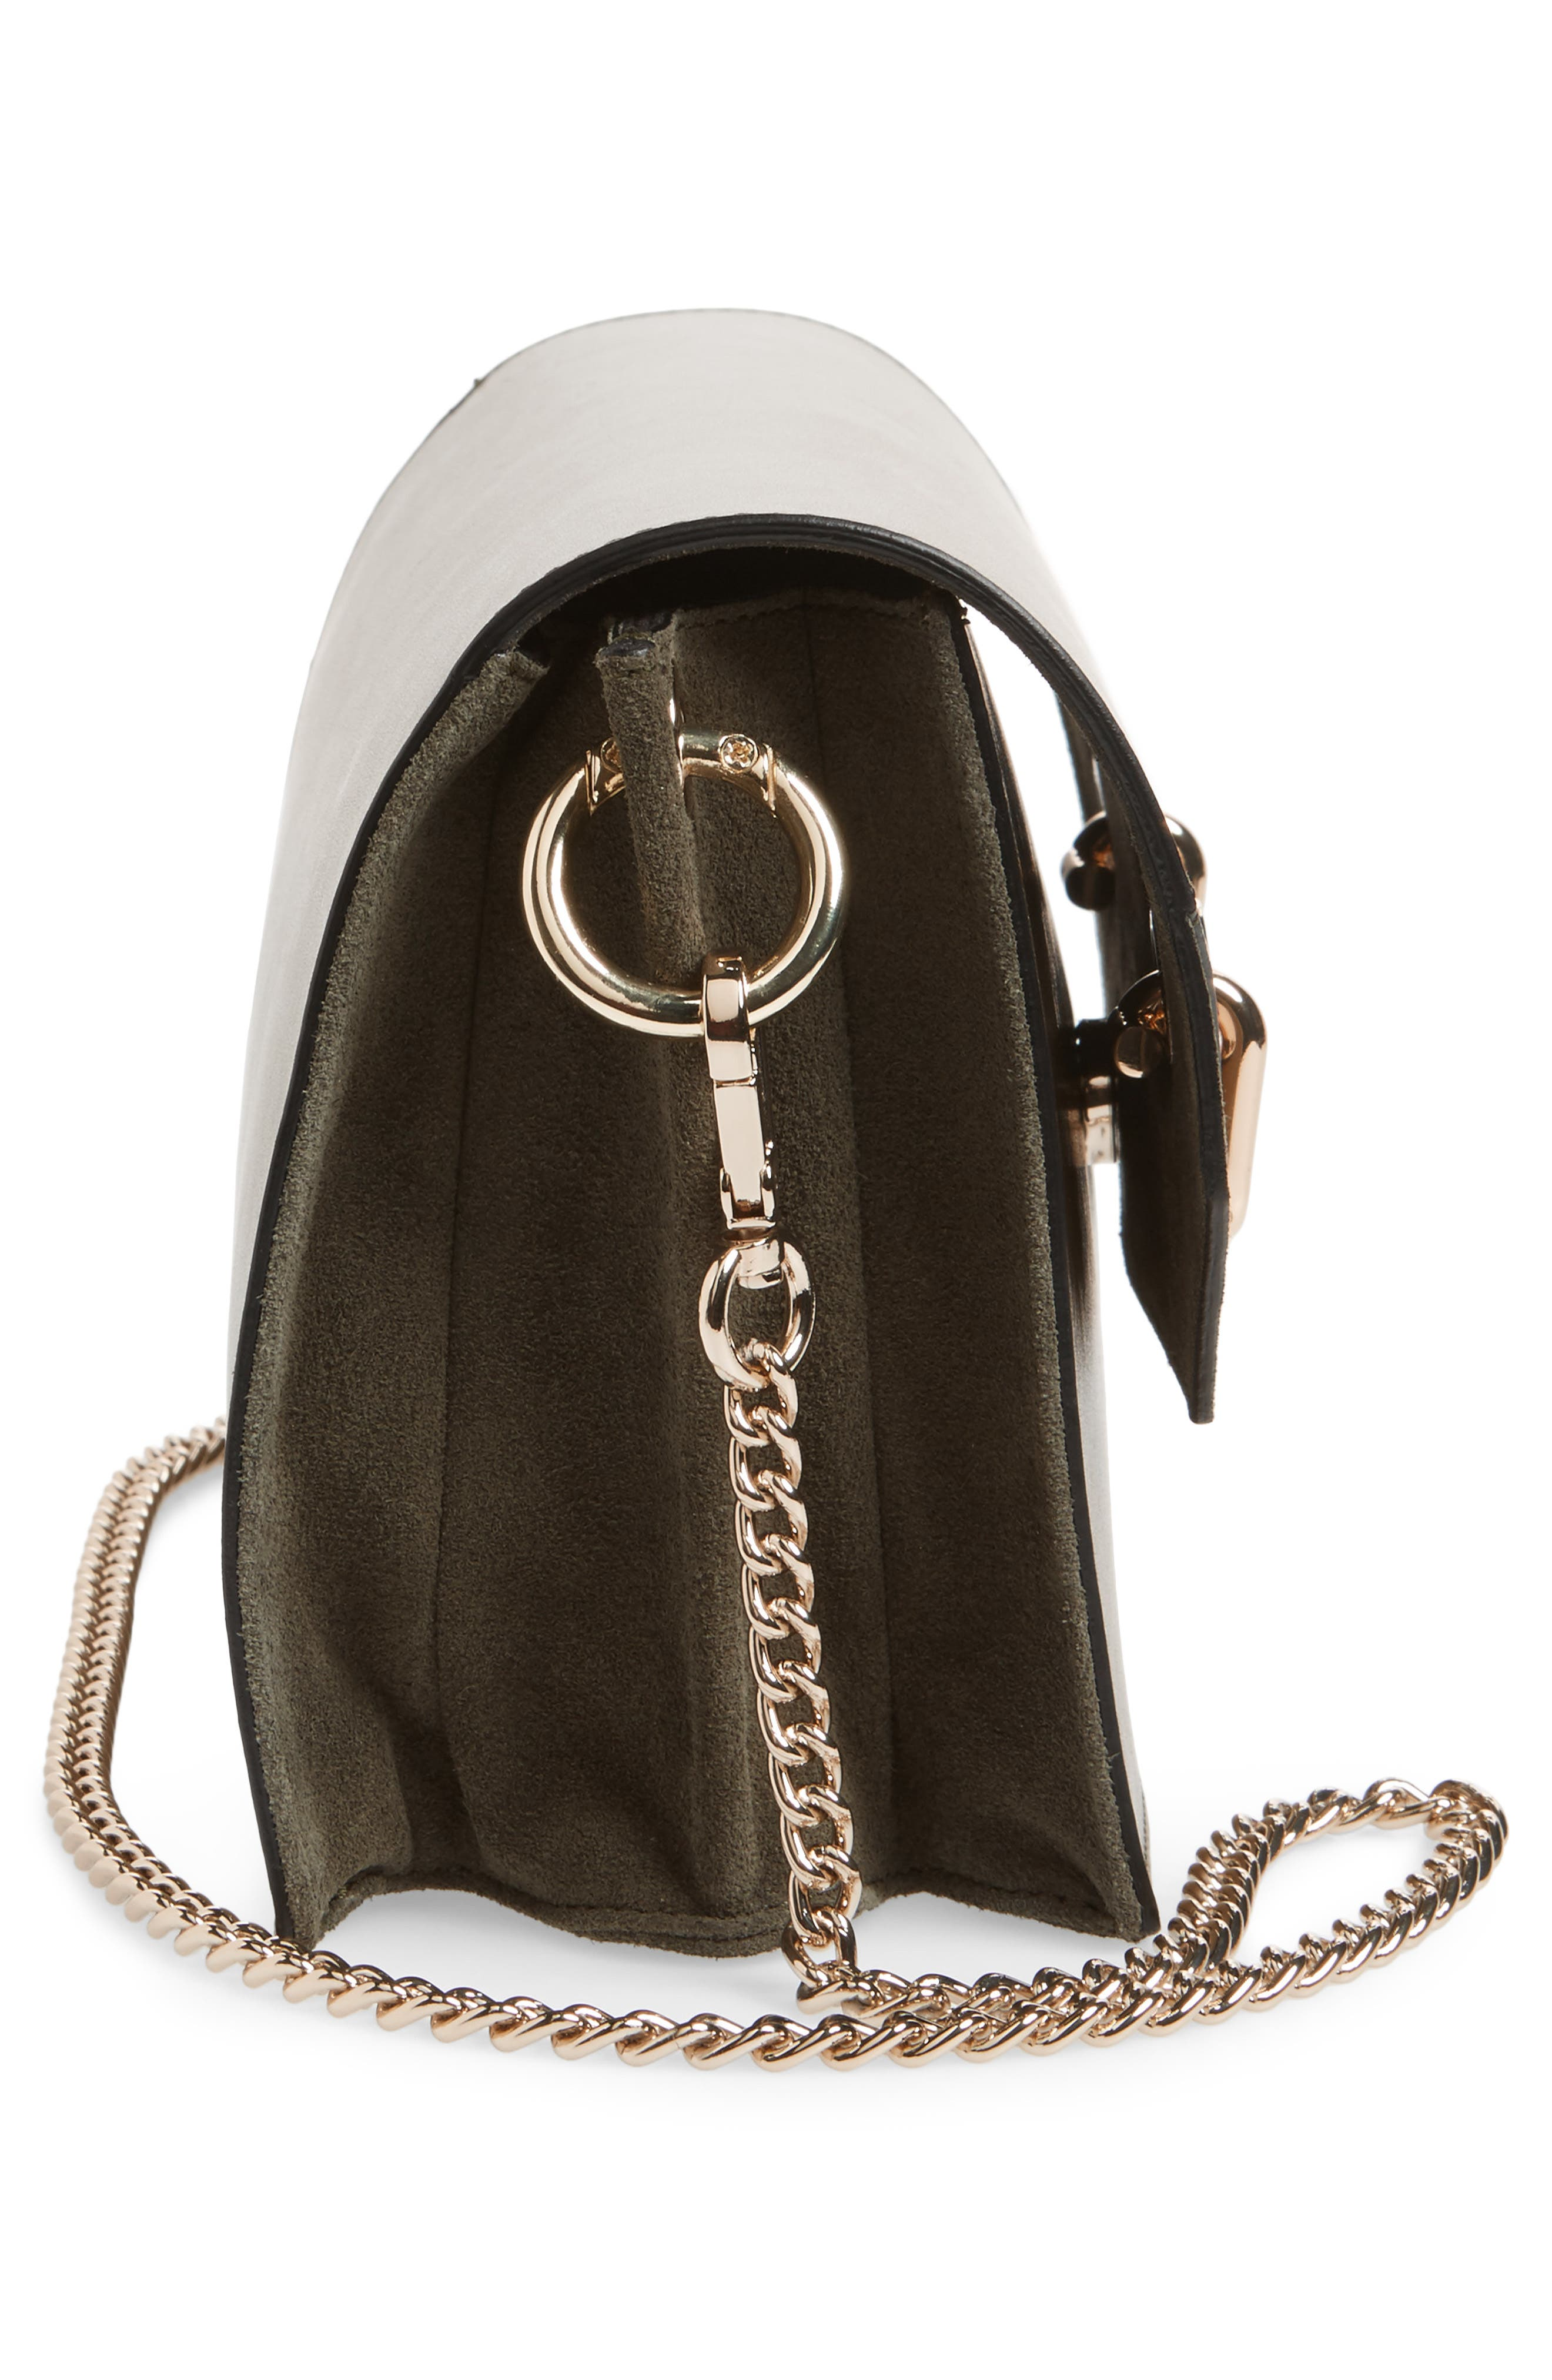 Premium Leather & Suede Soko Shoulder Bag,                             Alternate thumbnail 5, color,